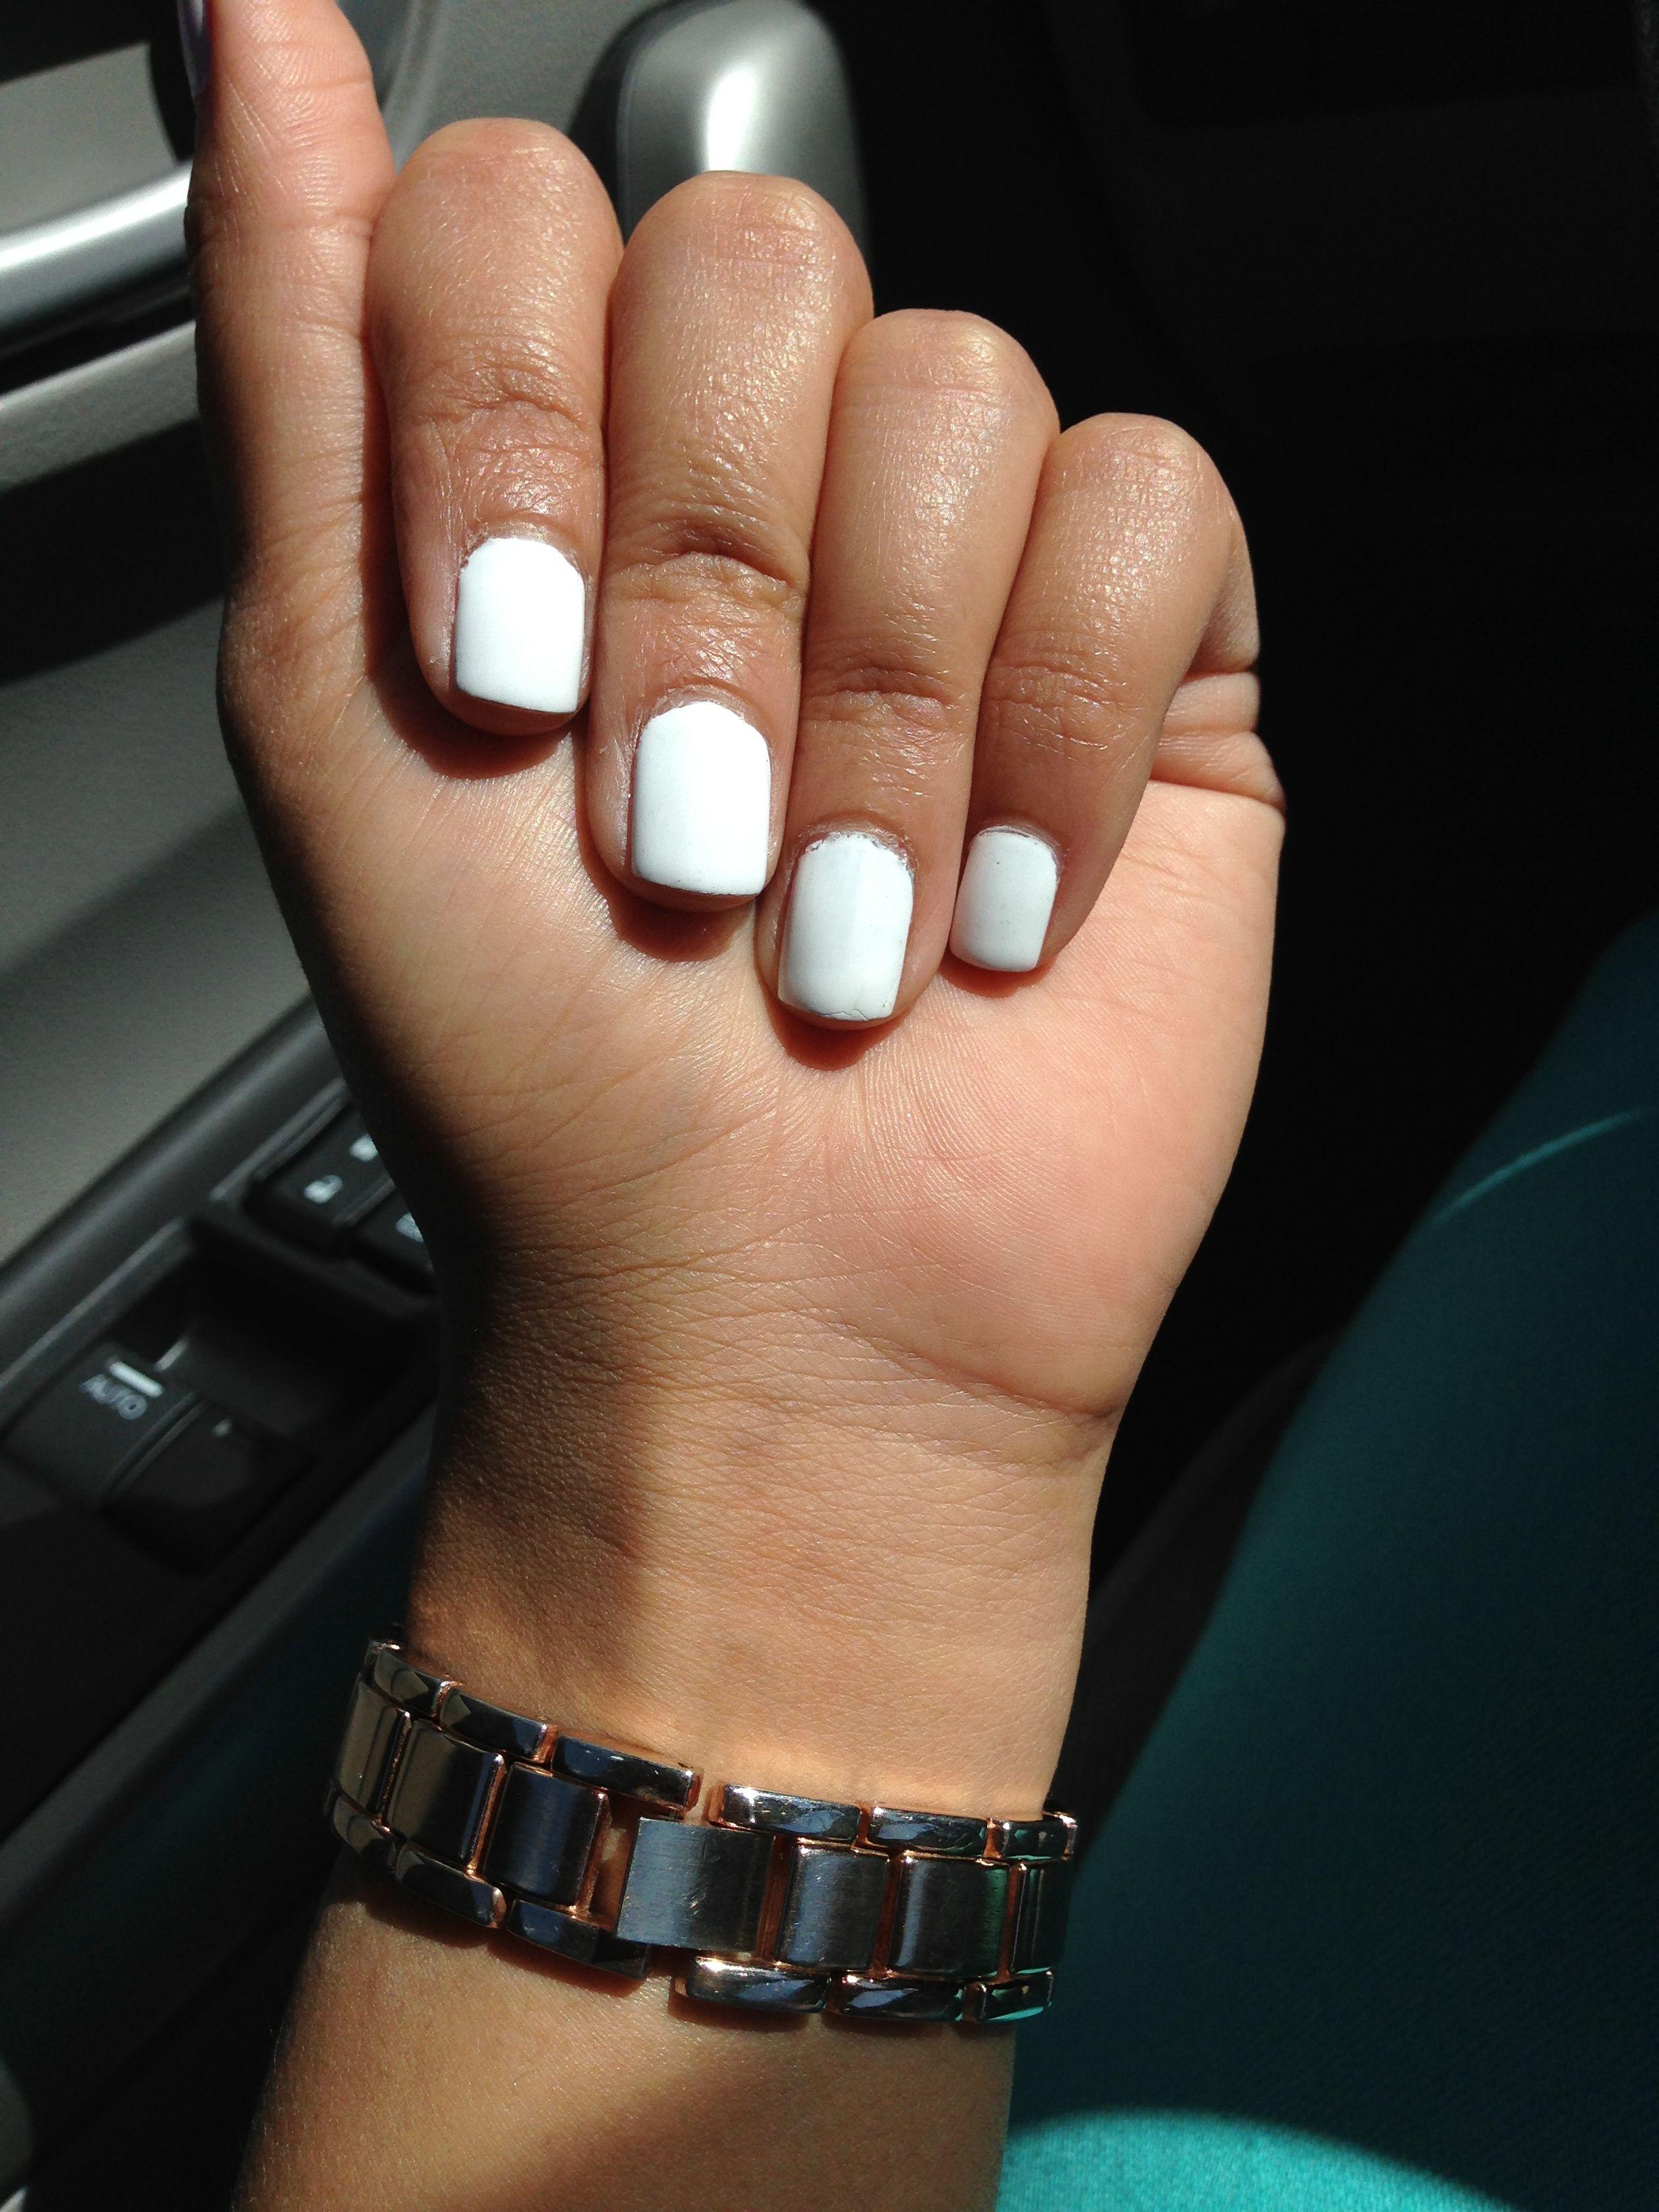 Kim Kardashian inspired short white nails. So fresh and clean ...